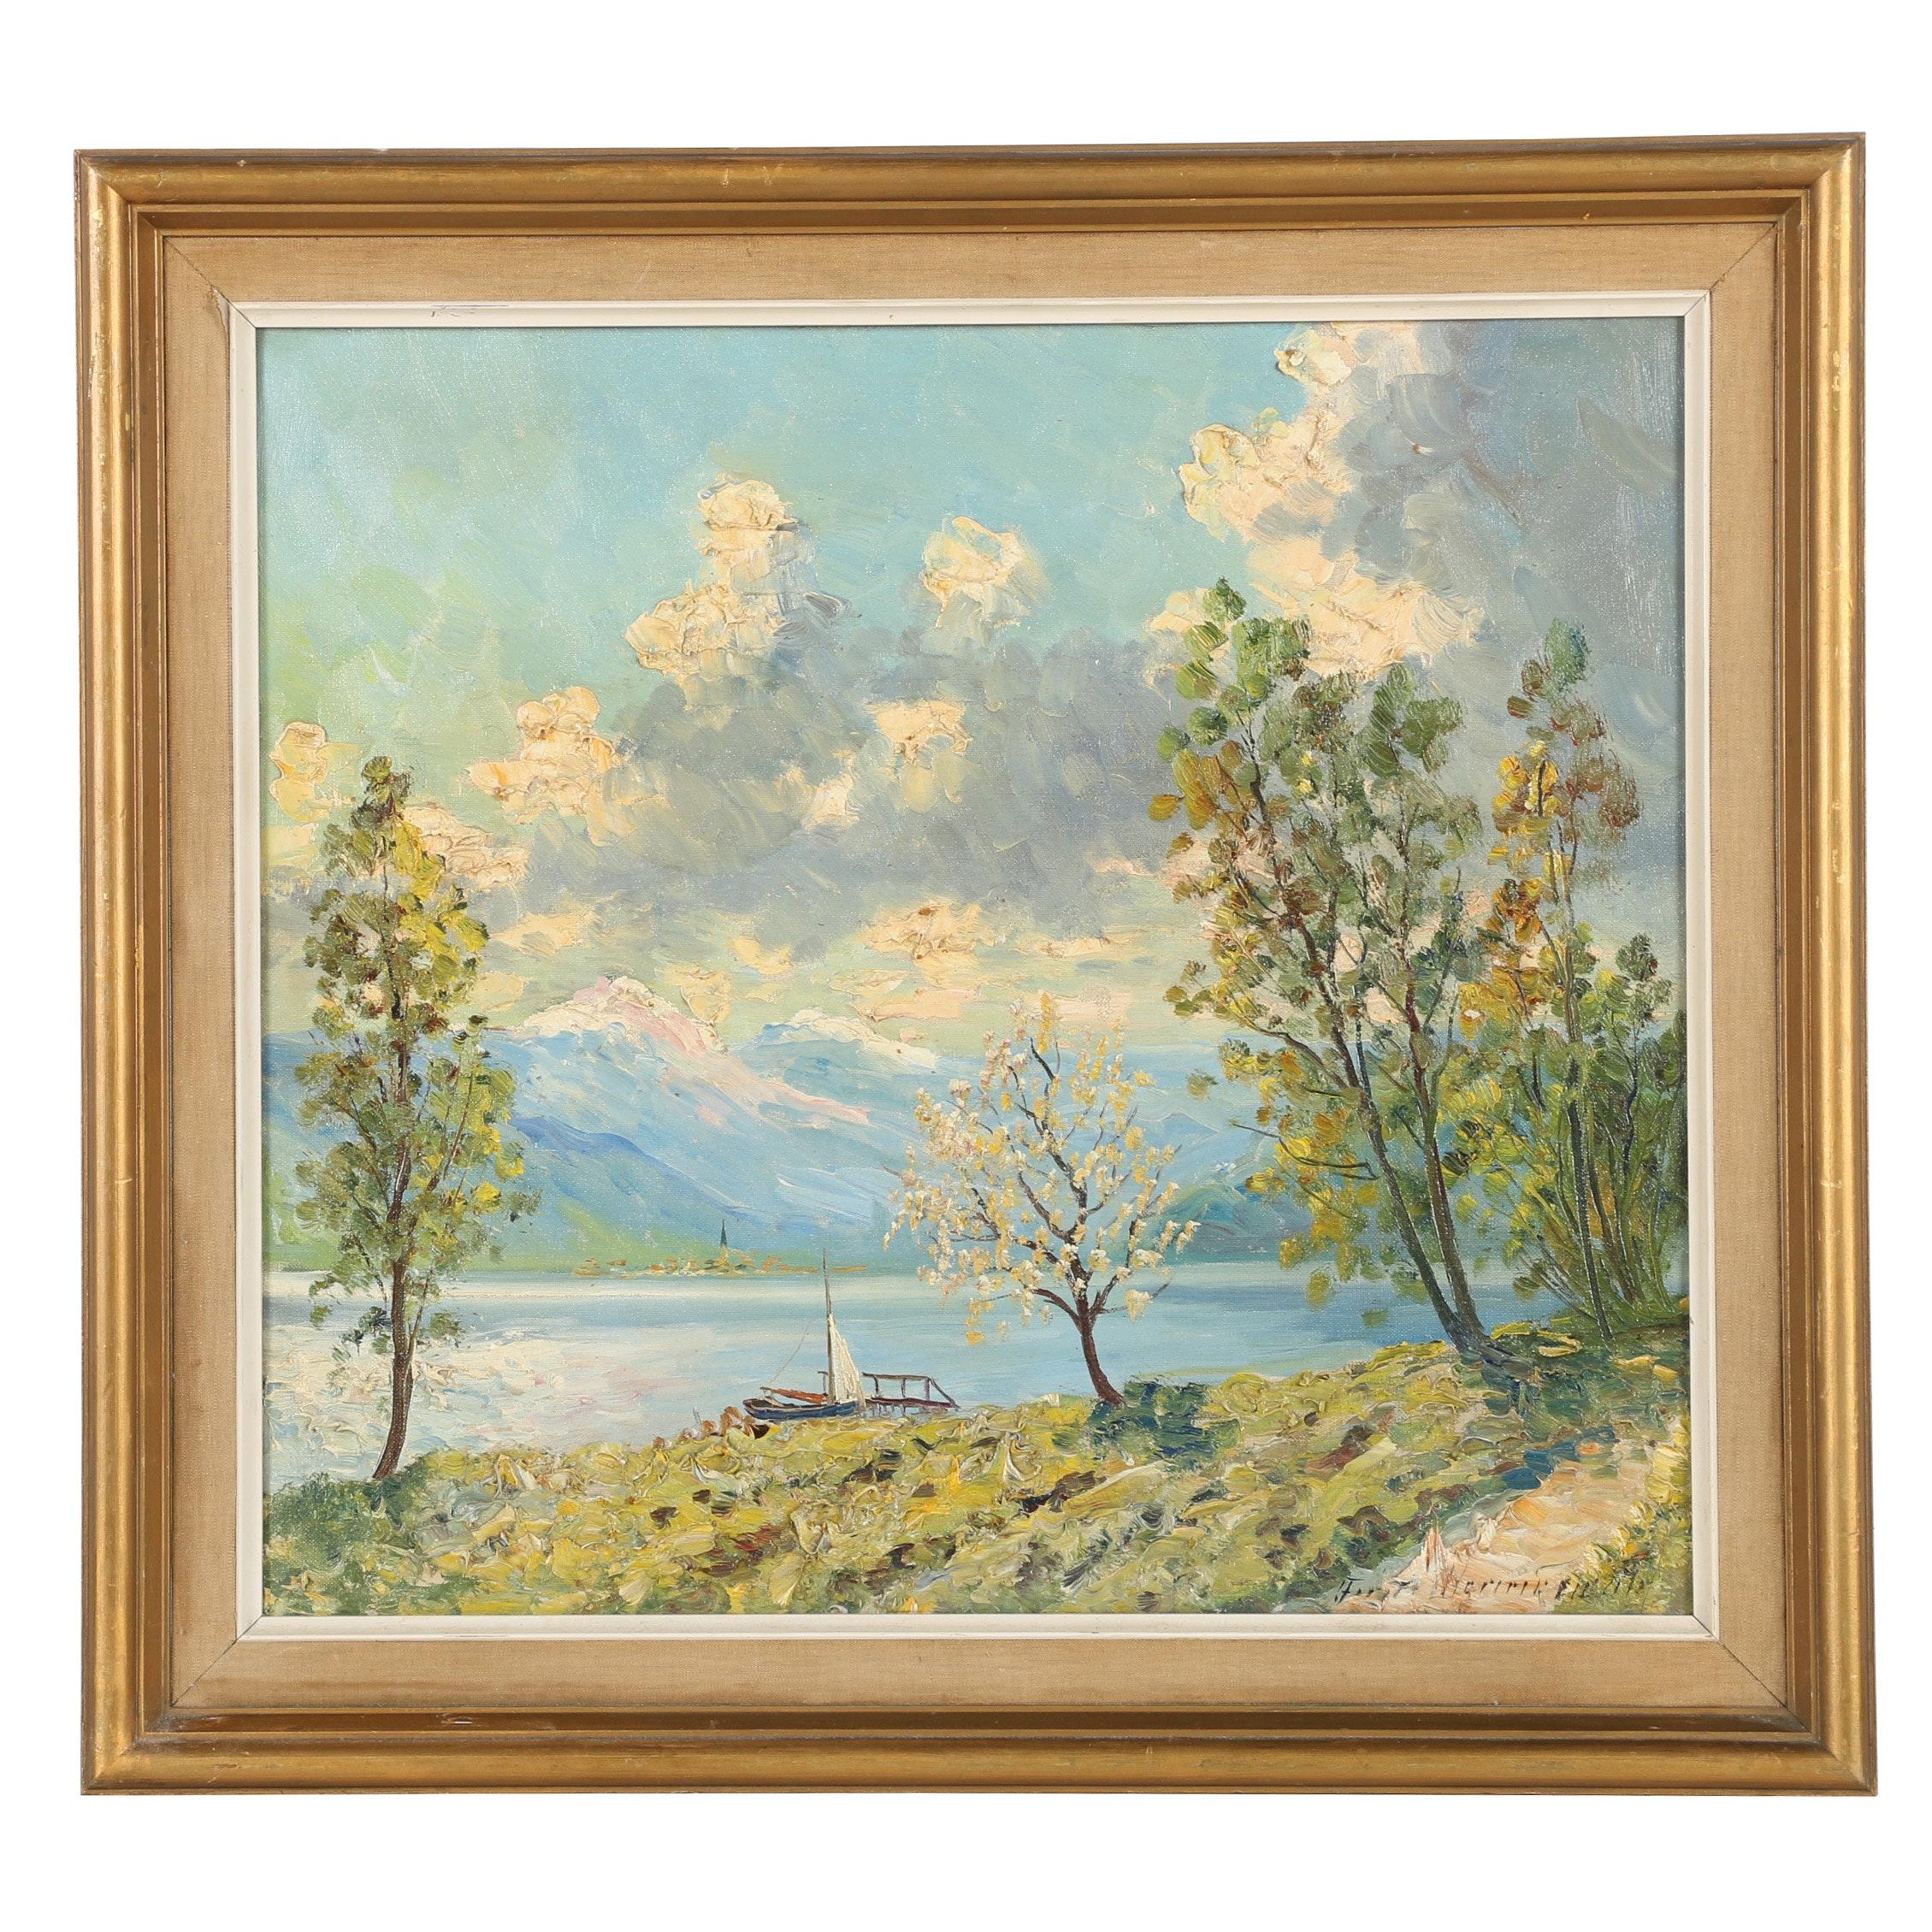 Finn Wennerwald Oil Painting